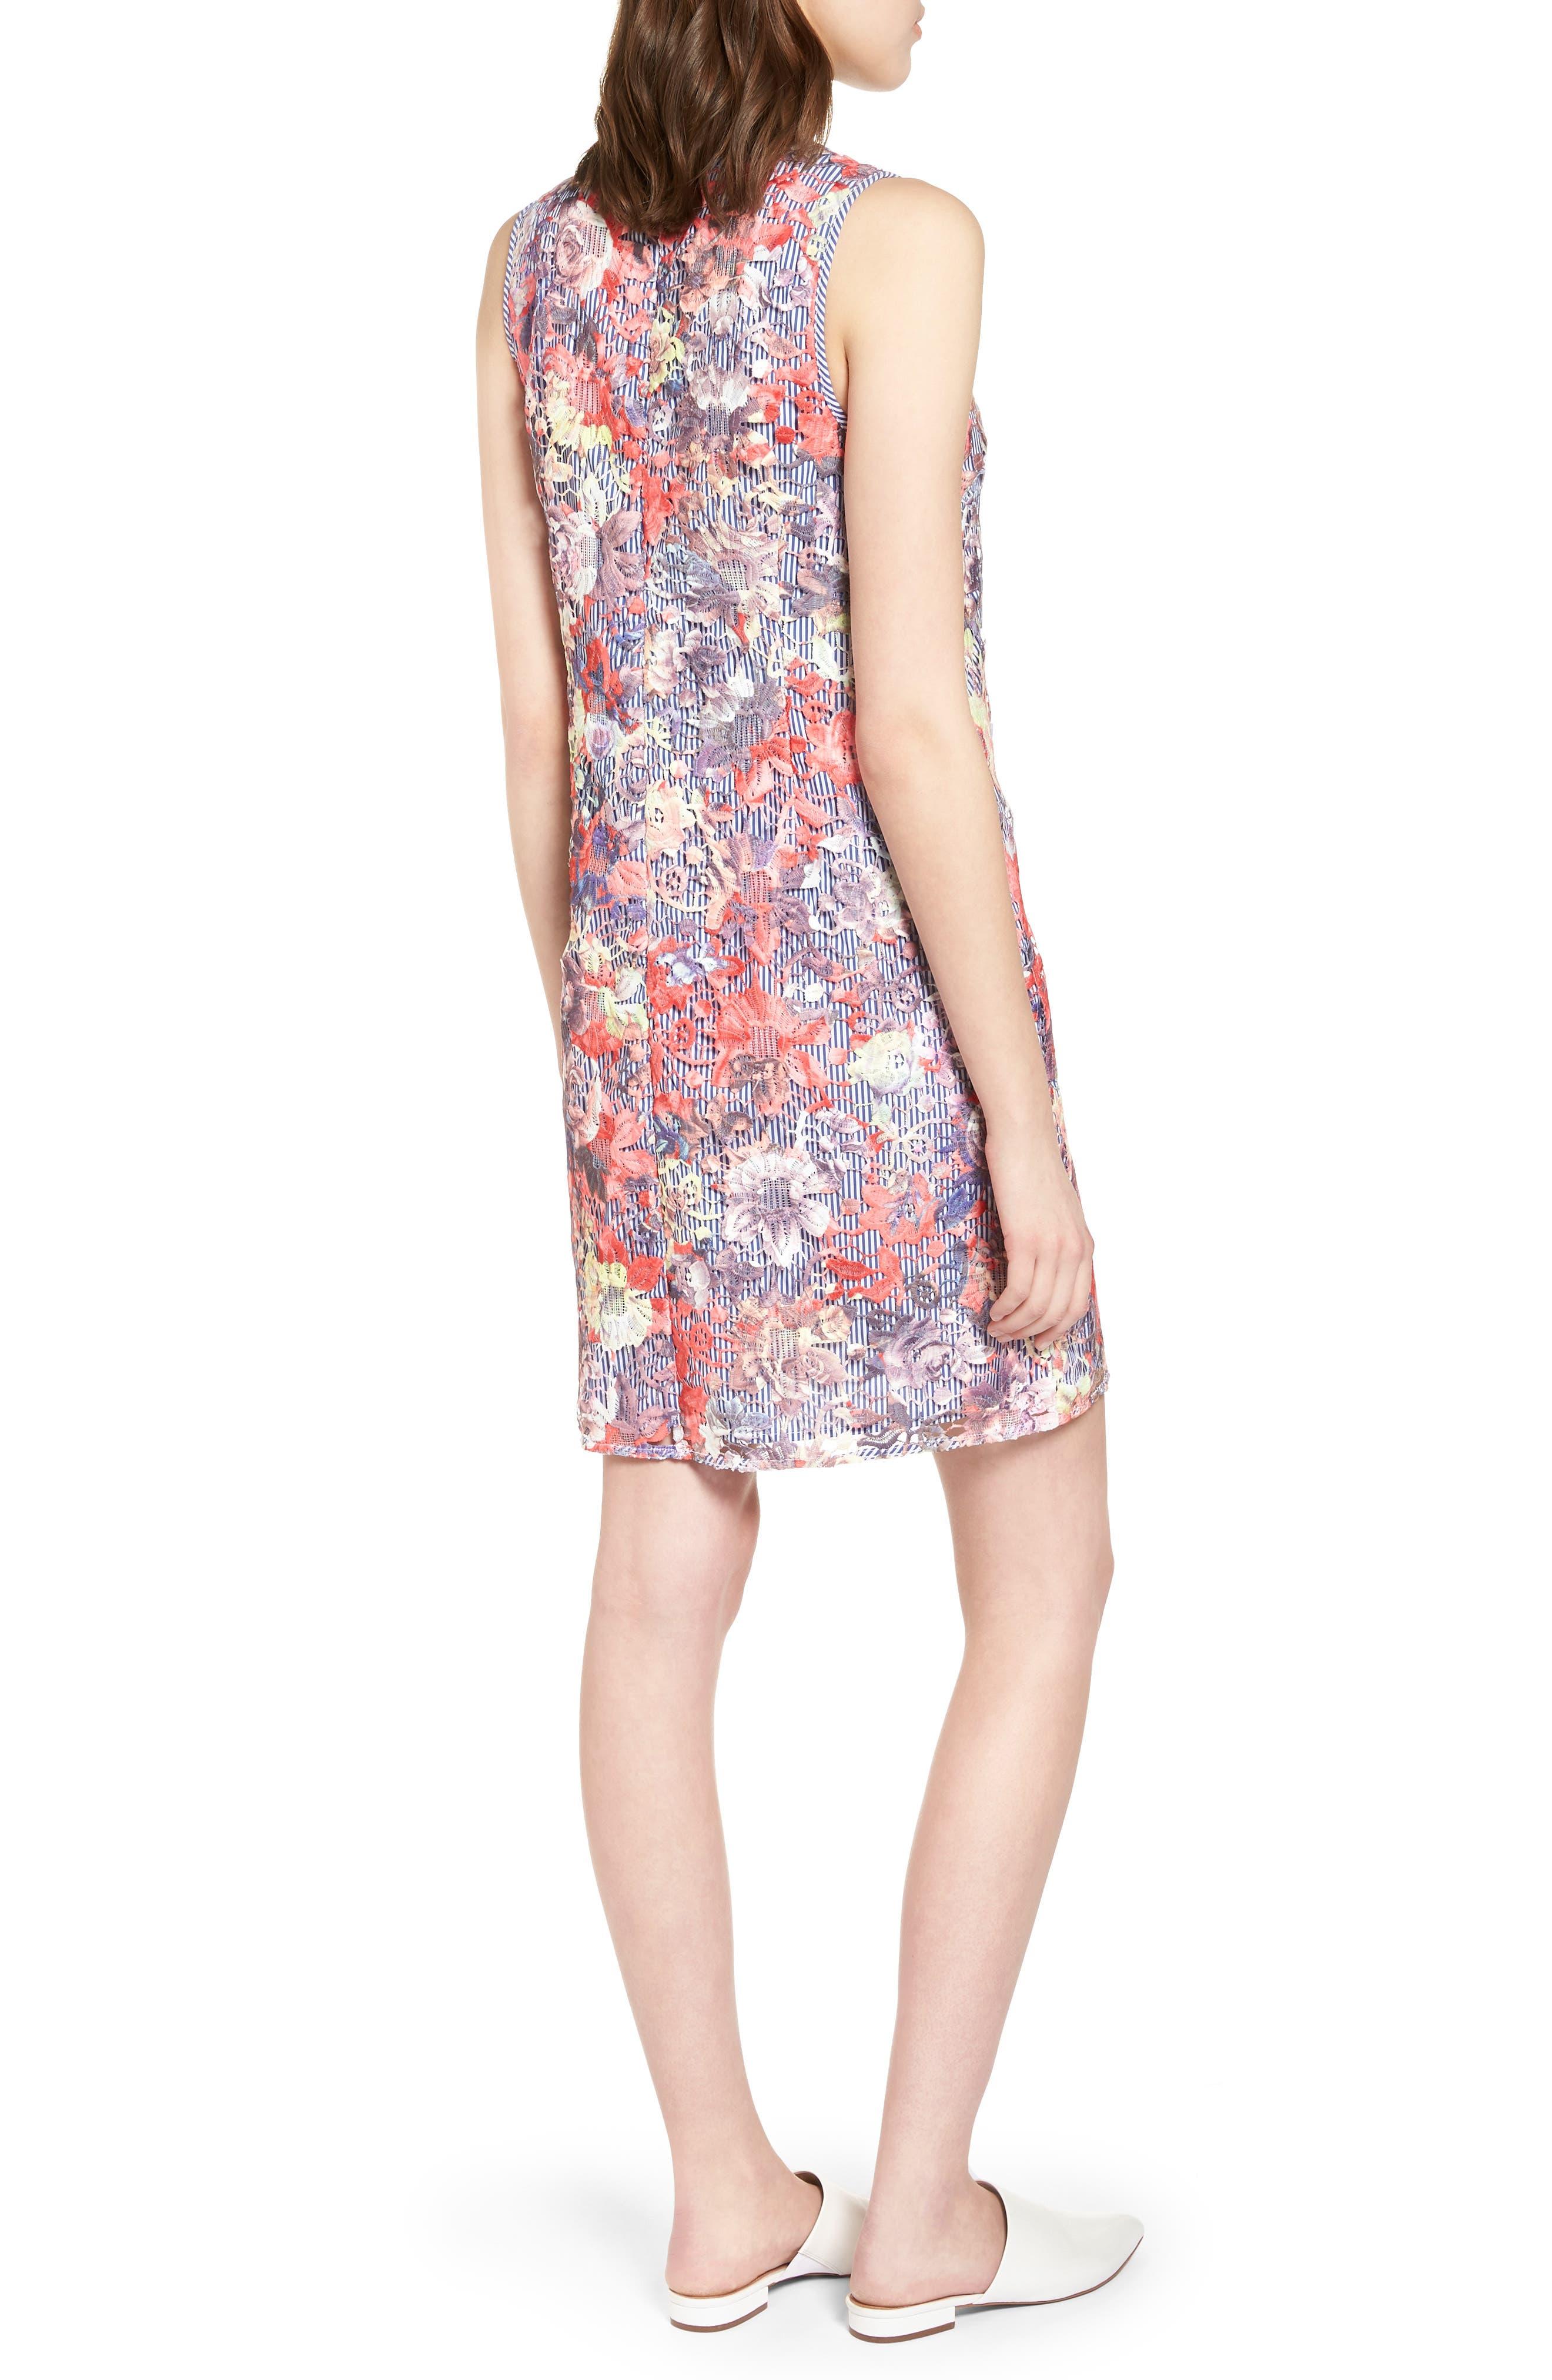 Lace Pinstripe Tank Dress,                             Alternate thumbnail 2, color,                             Coral Lace Pattern